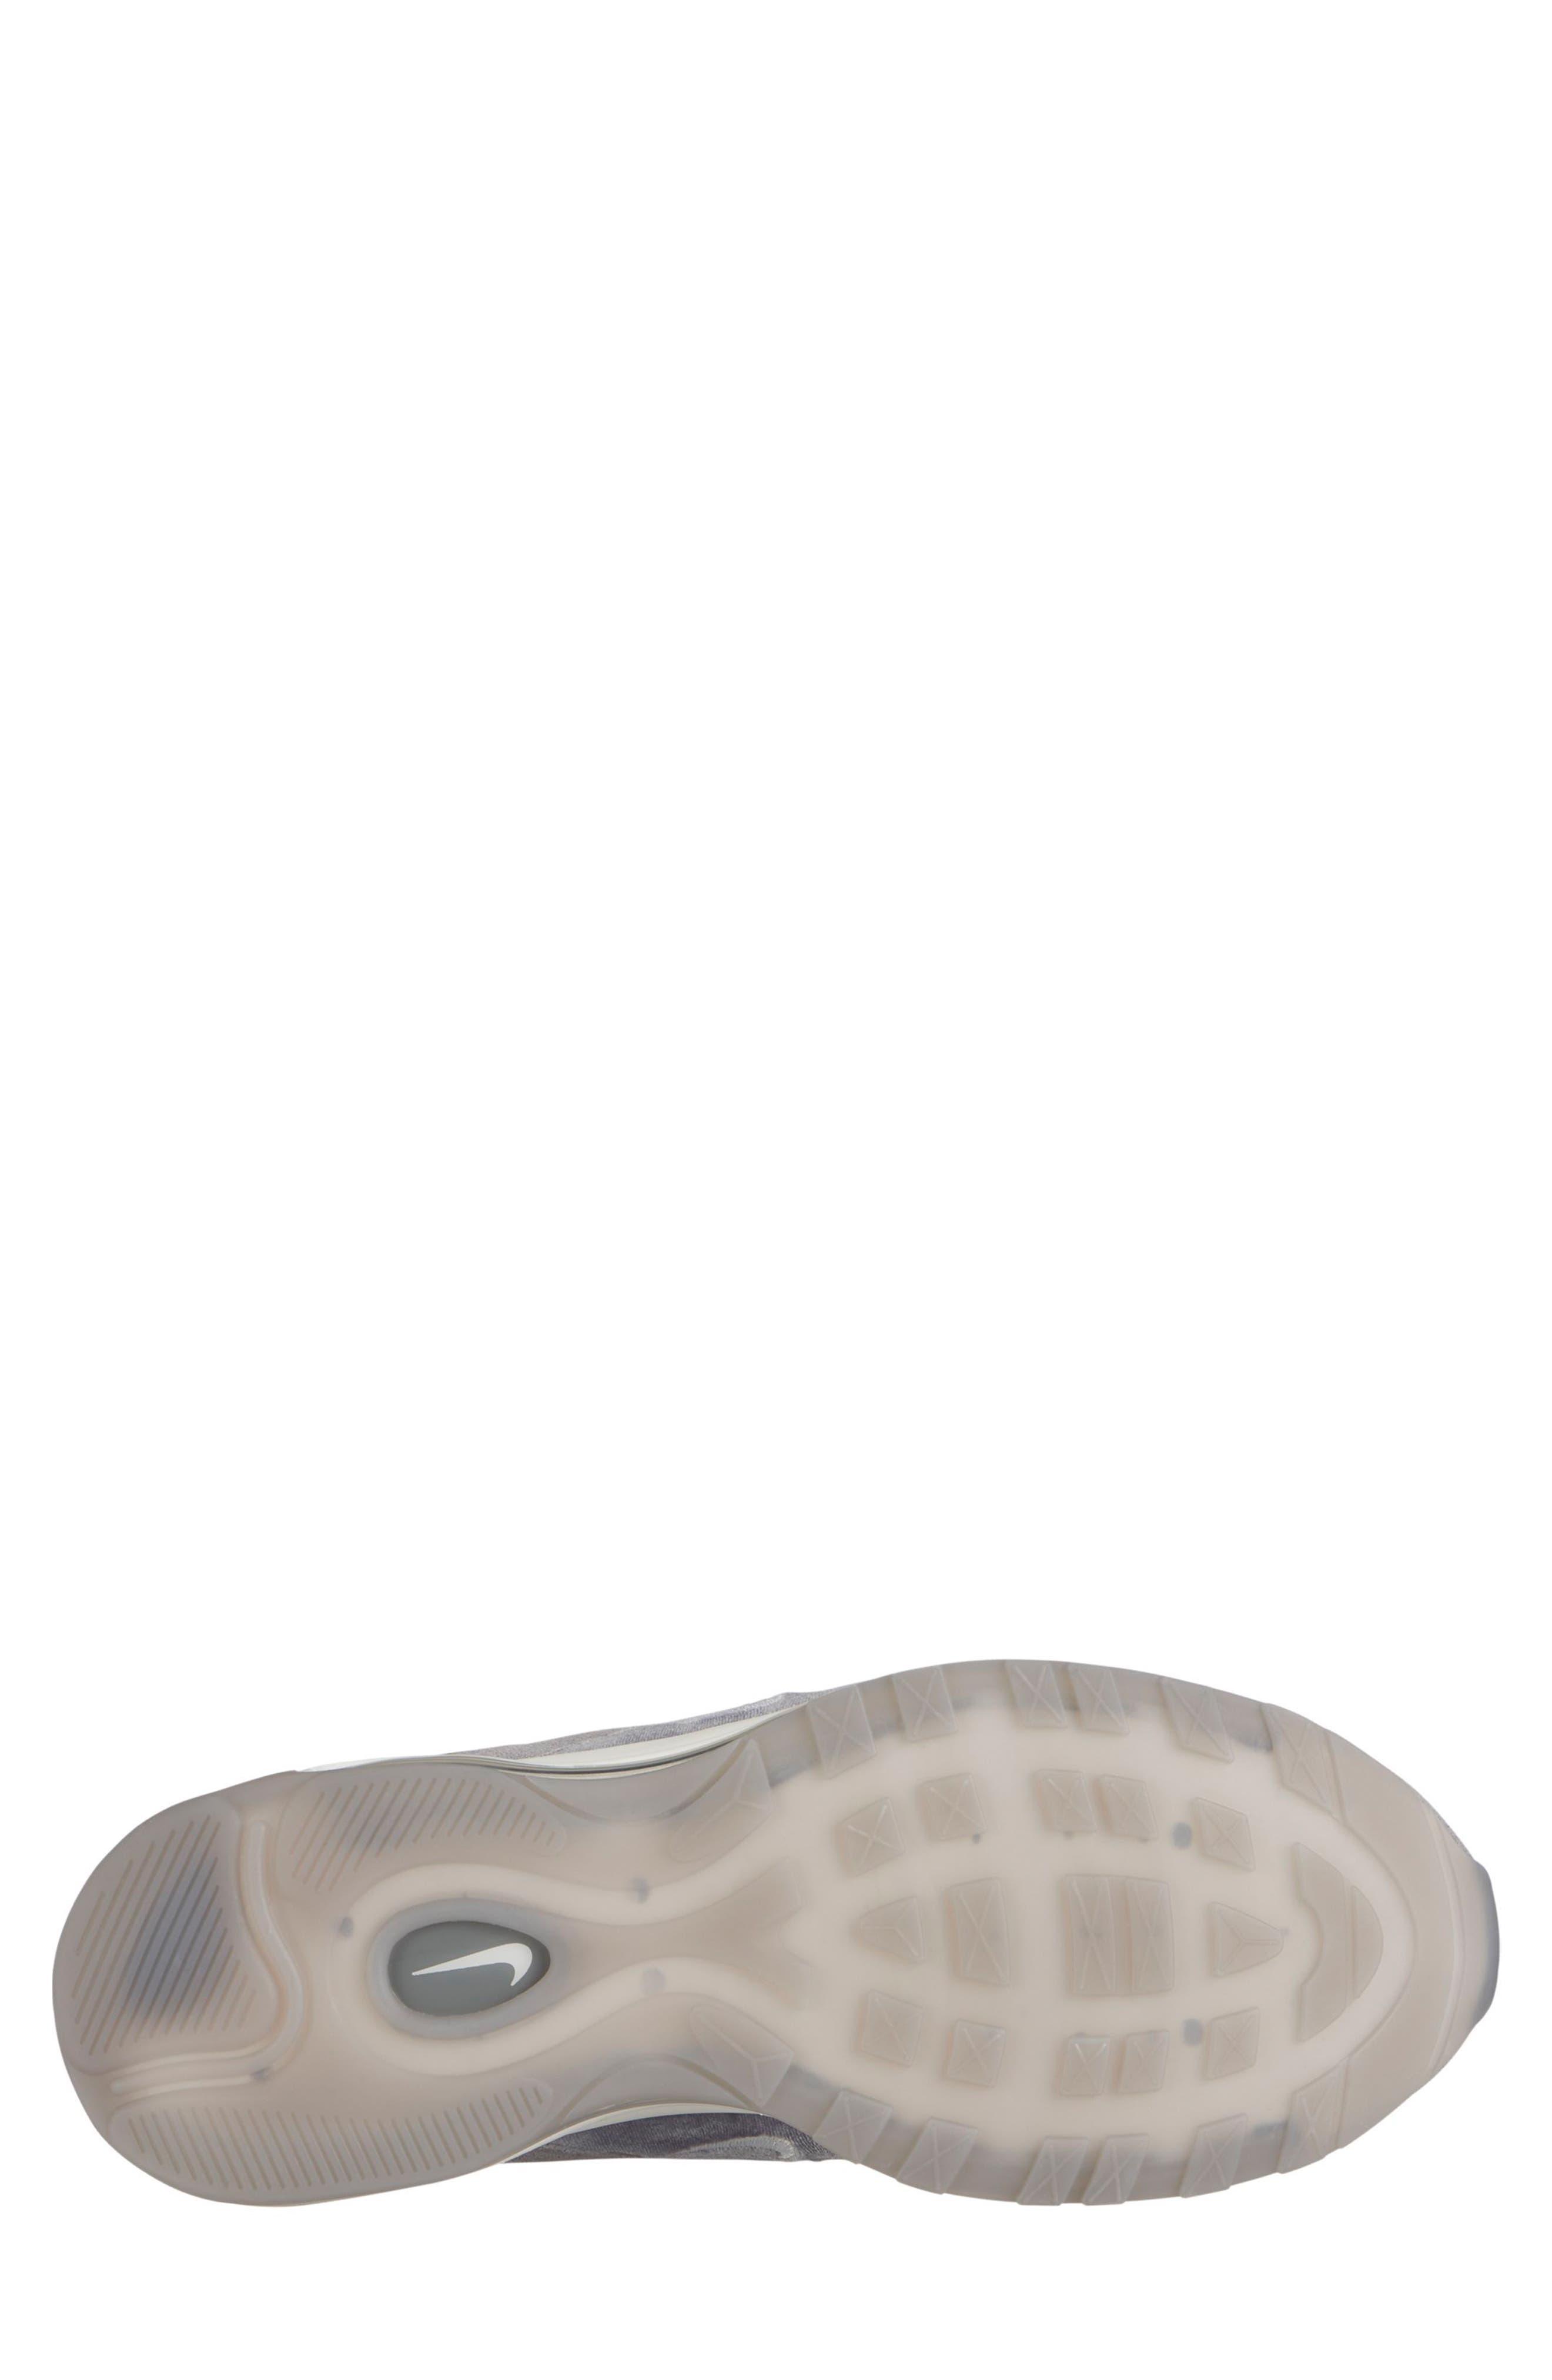 Air Max 97 Ultra '17 LX Sneaker,                             Alternate thumbnail 2, color,                             021